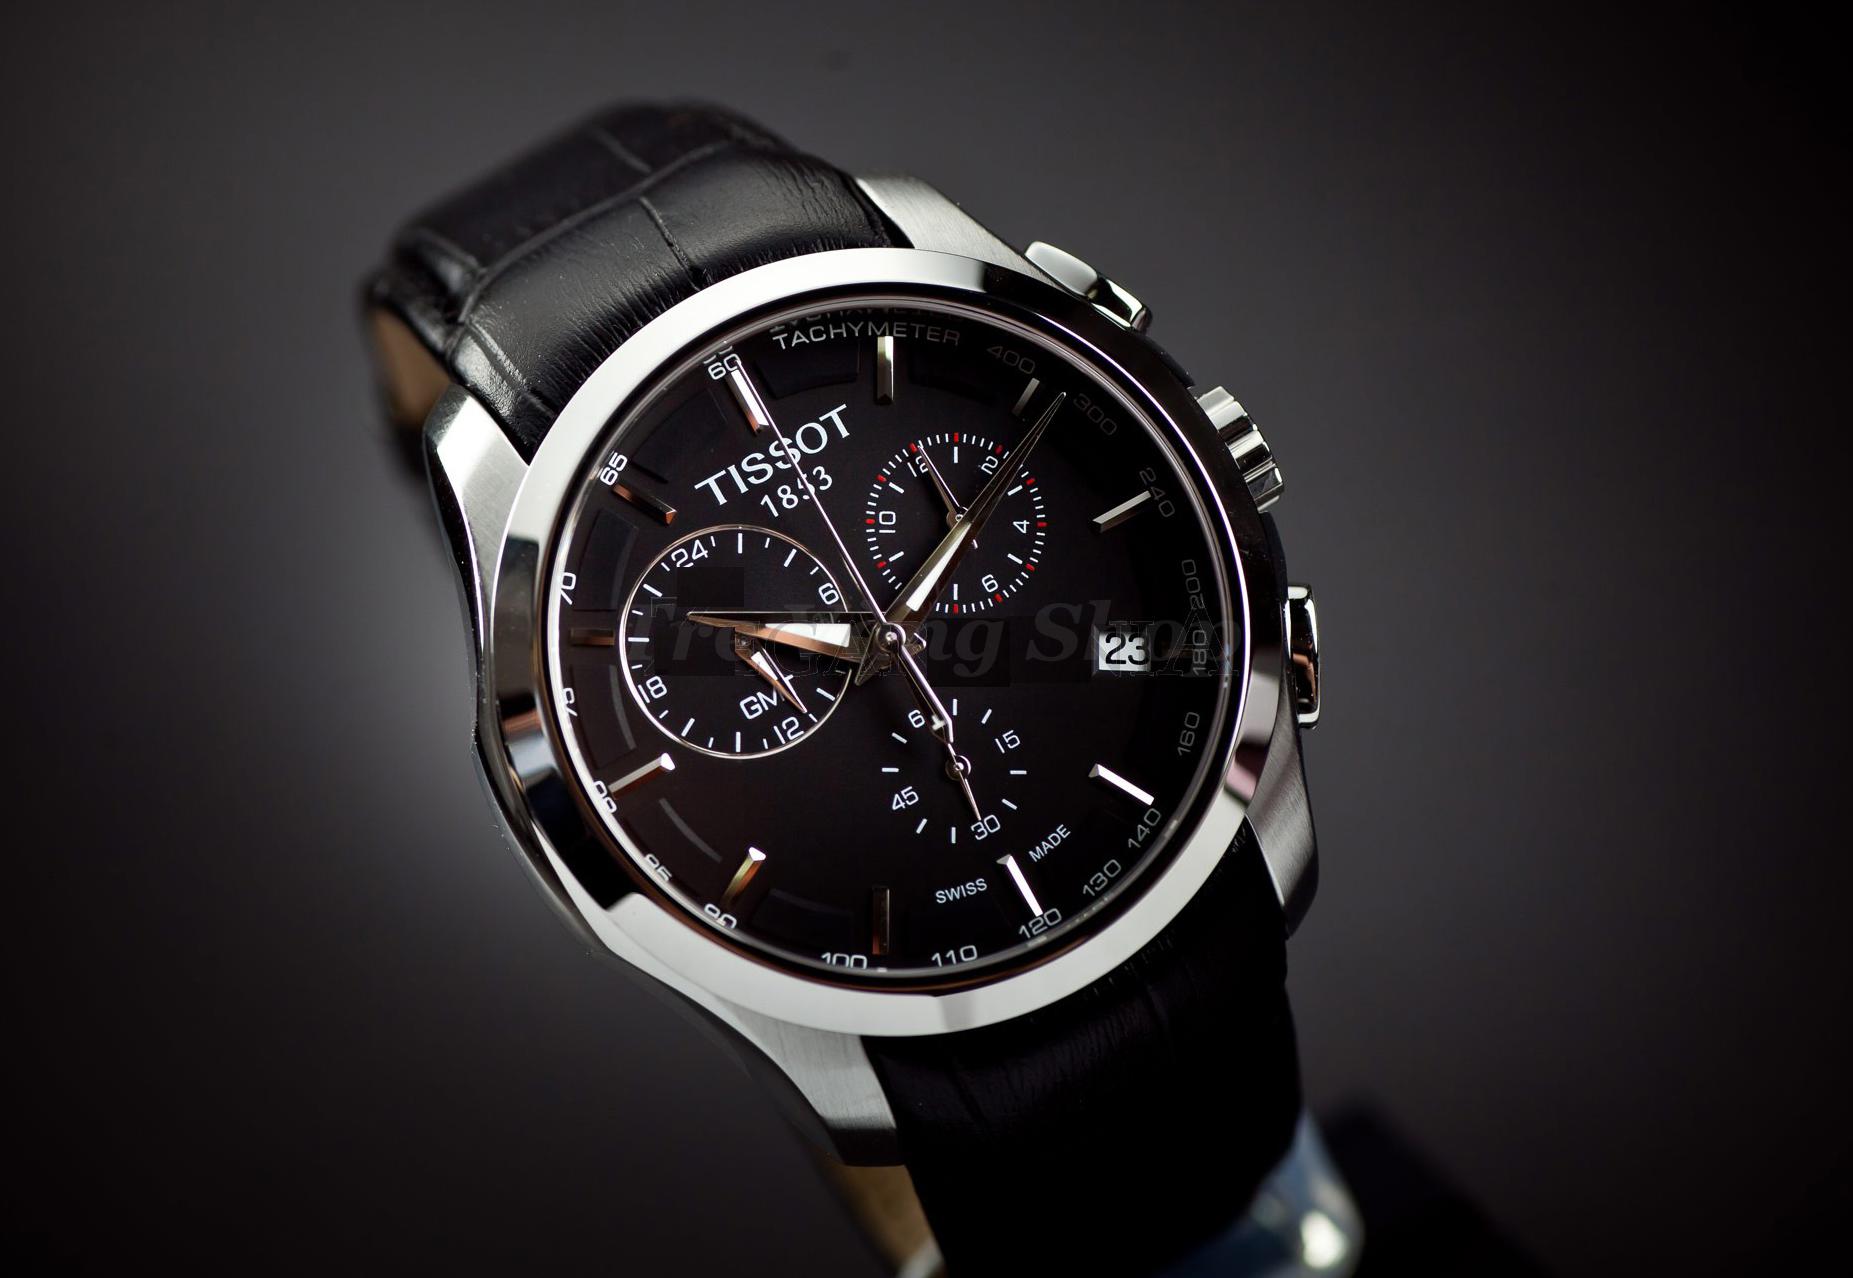 Đồng hồ nam Tissot 1853 T035.439.16.051.00 T-Sport mặt tròn rộng